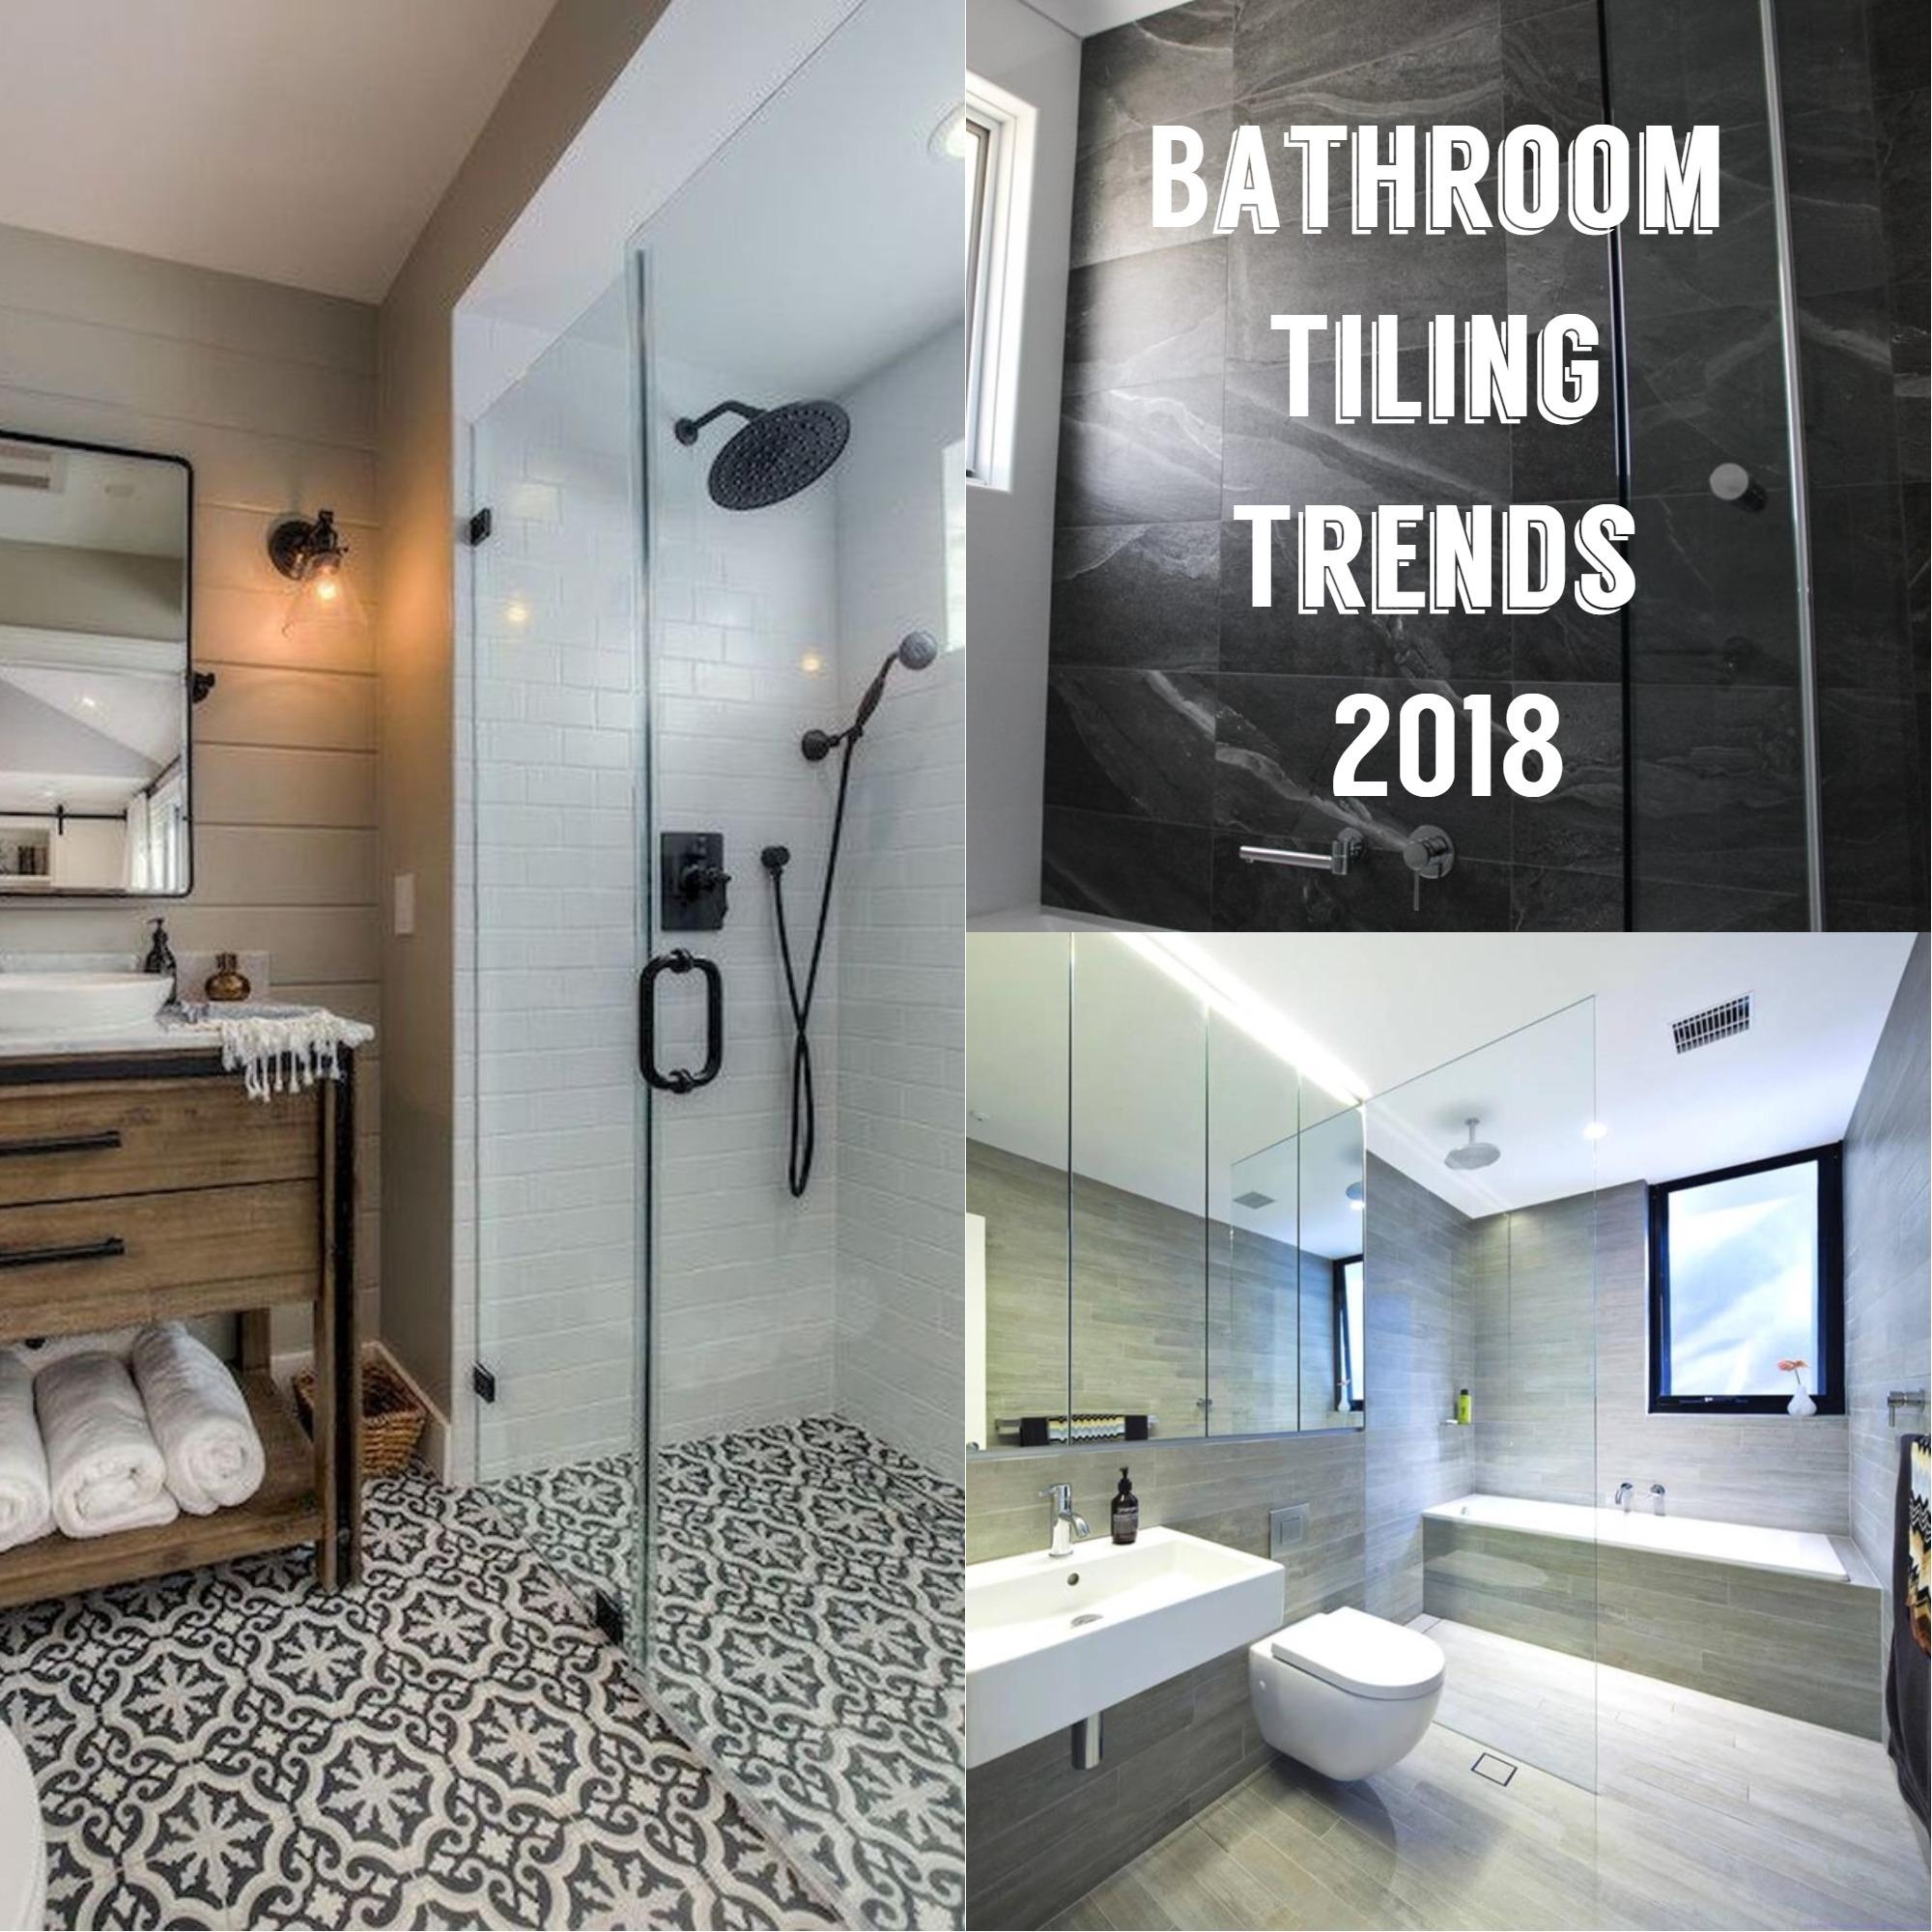 Excellent Bathroom Tiling Trends Of 2018 Download Free Architecture Designs Scobabritishbridgeorg